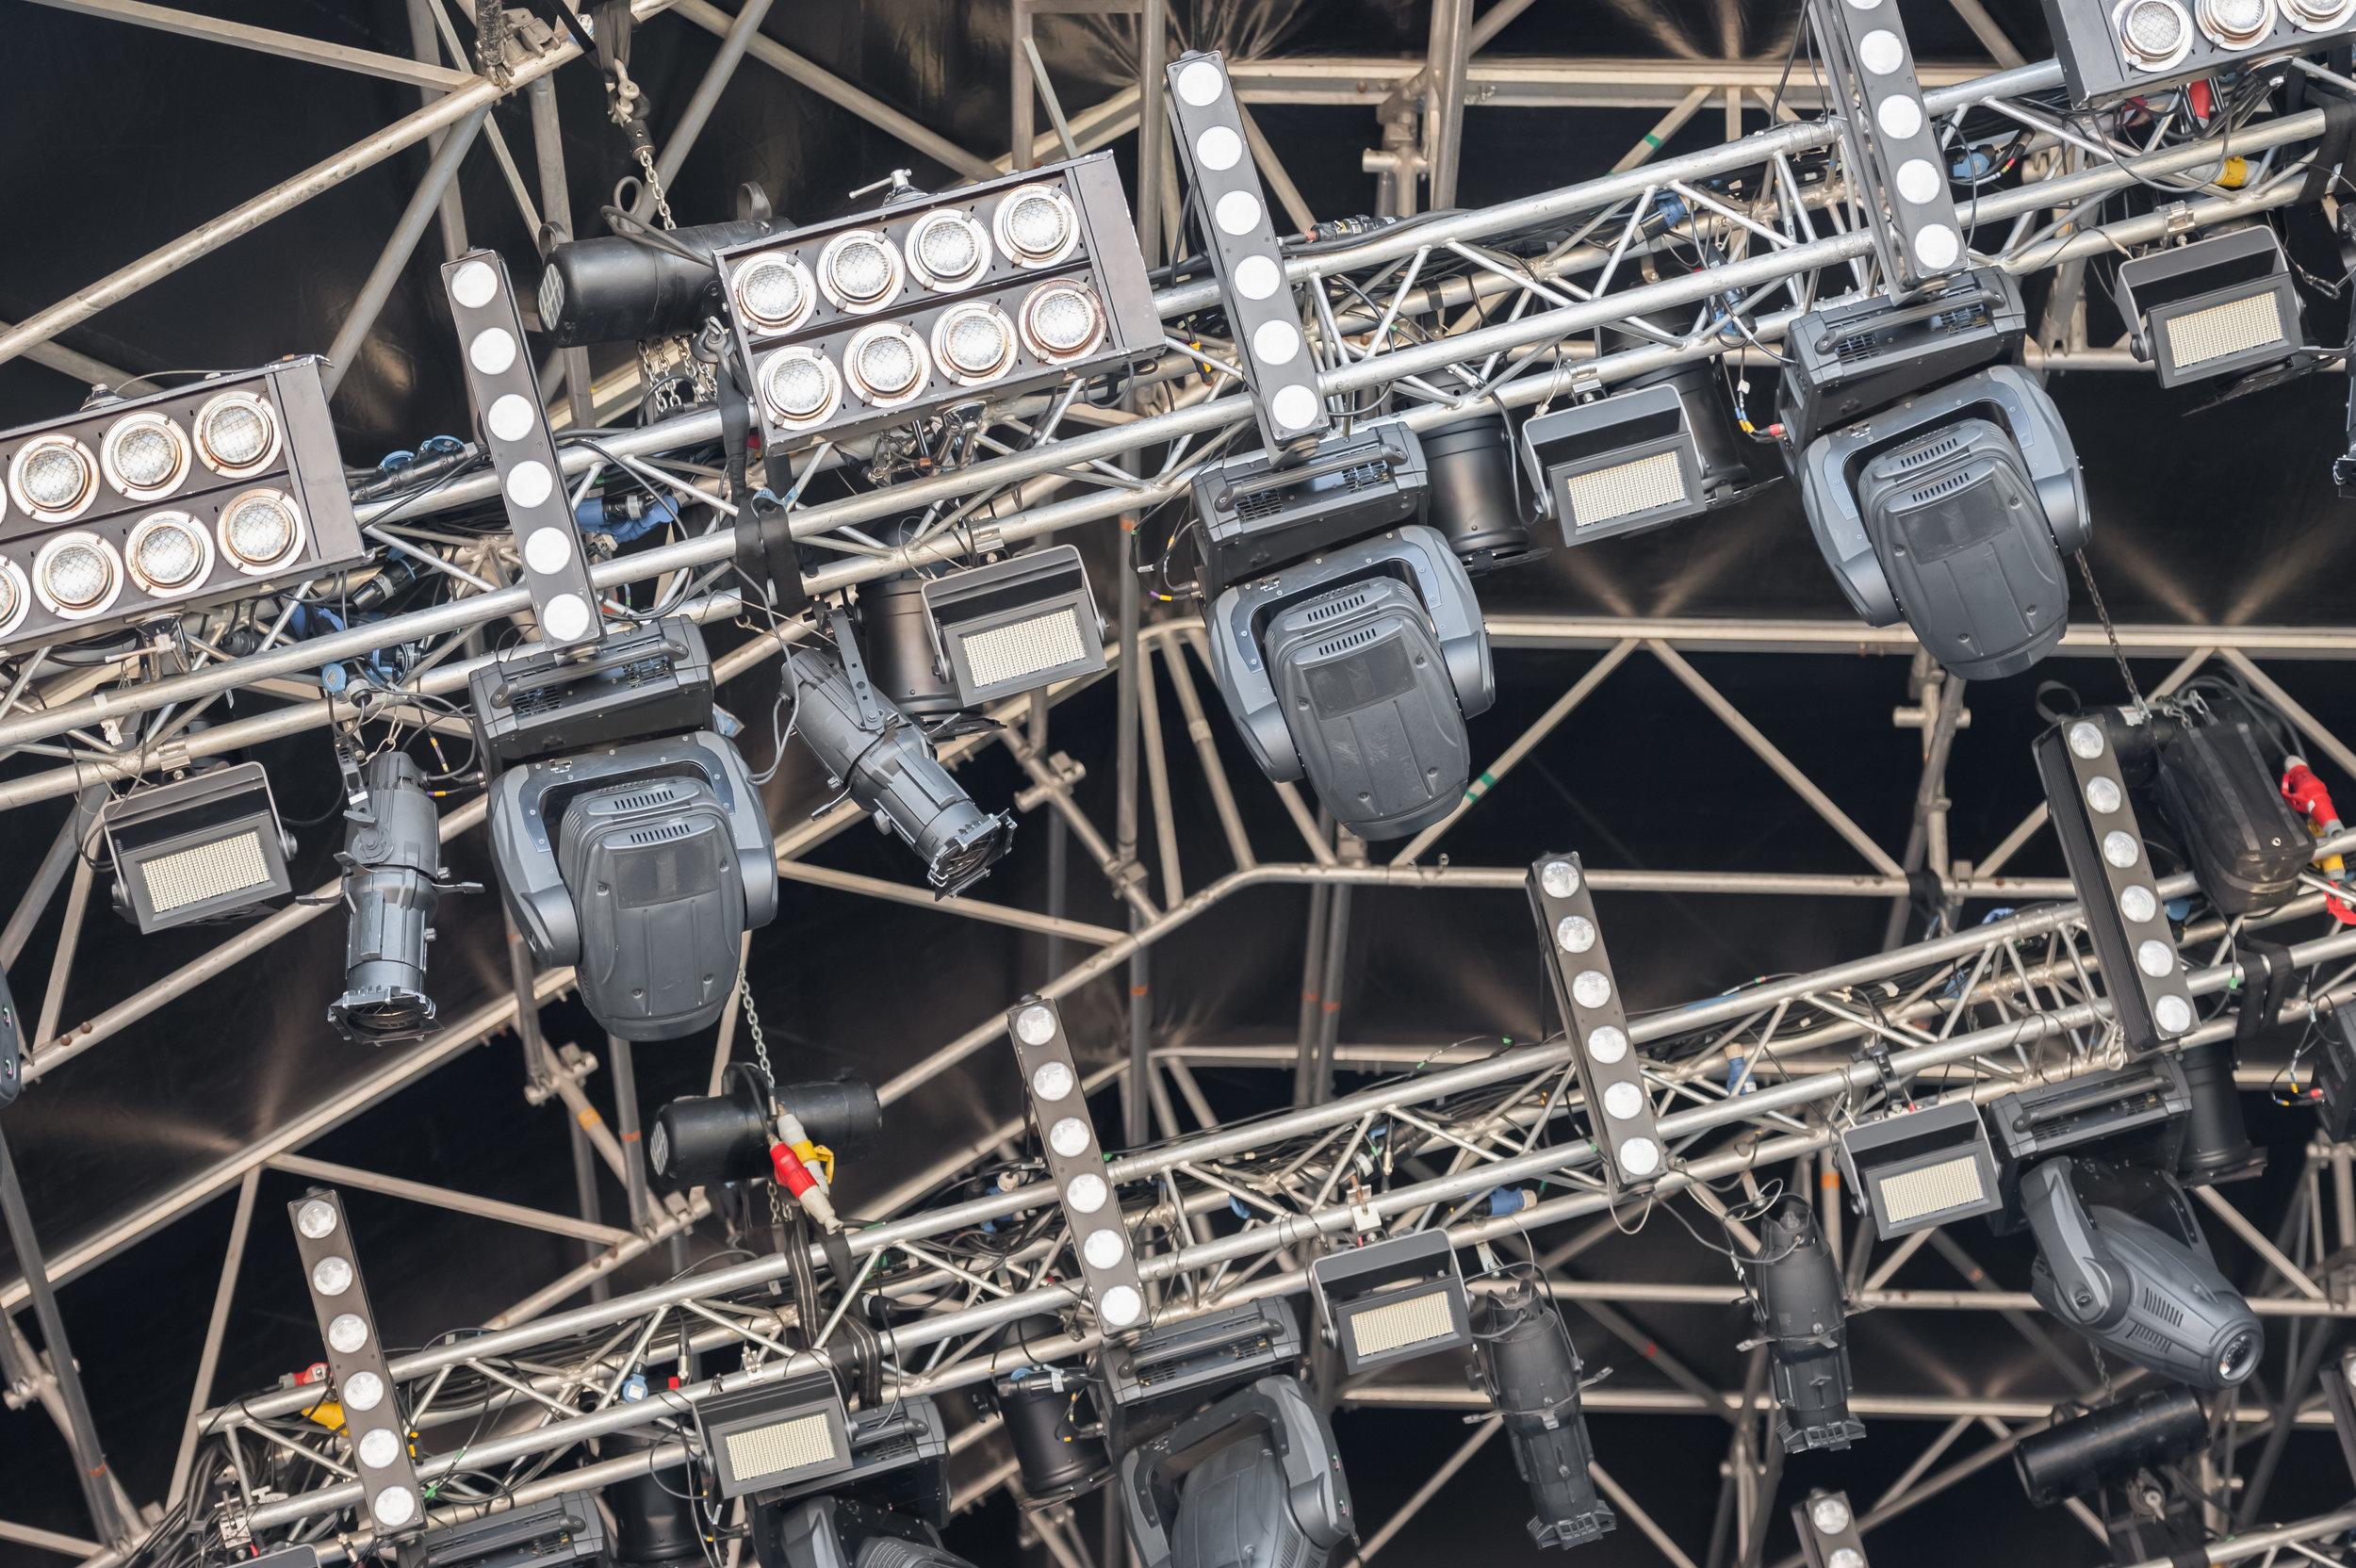 festival-lighting-rig-PRZRMWX.jpg